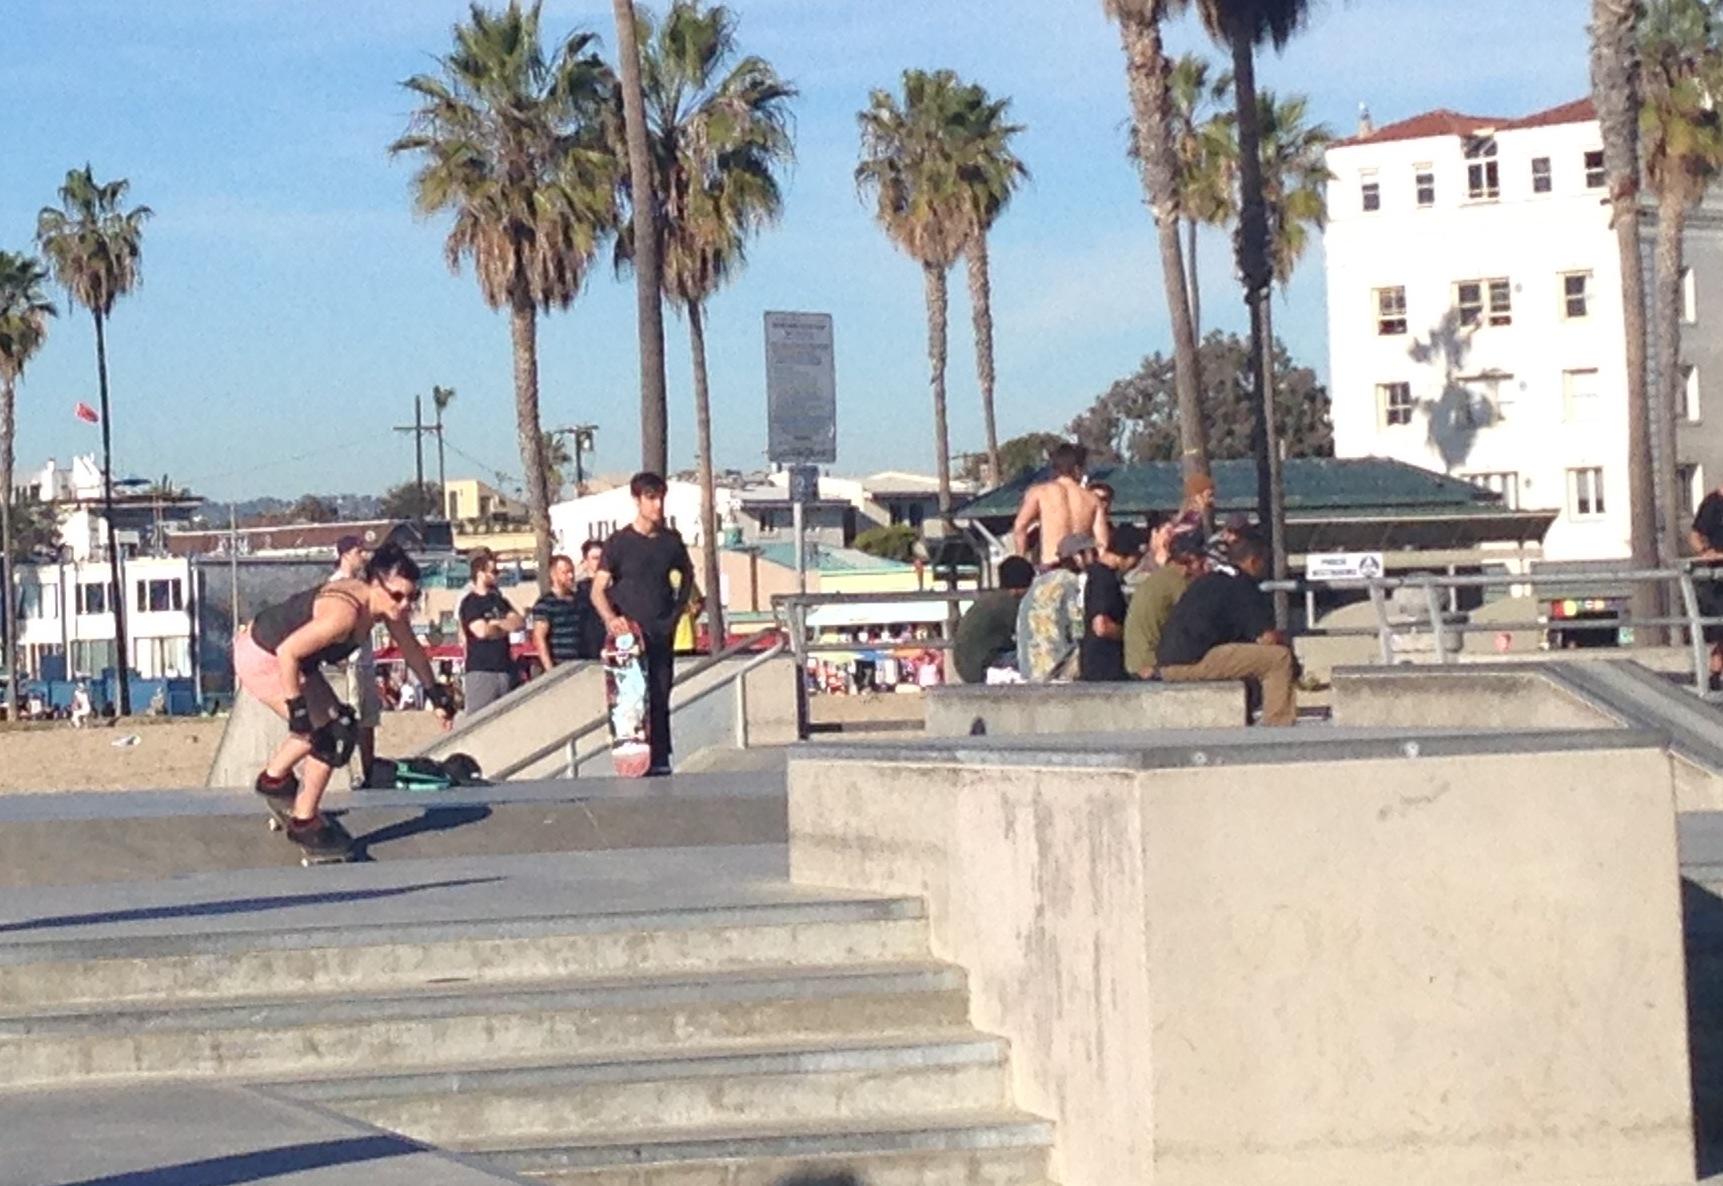 Skateboarding at Venice Beach